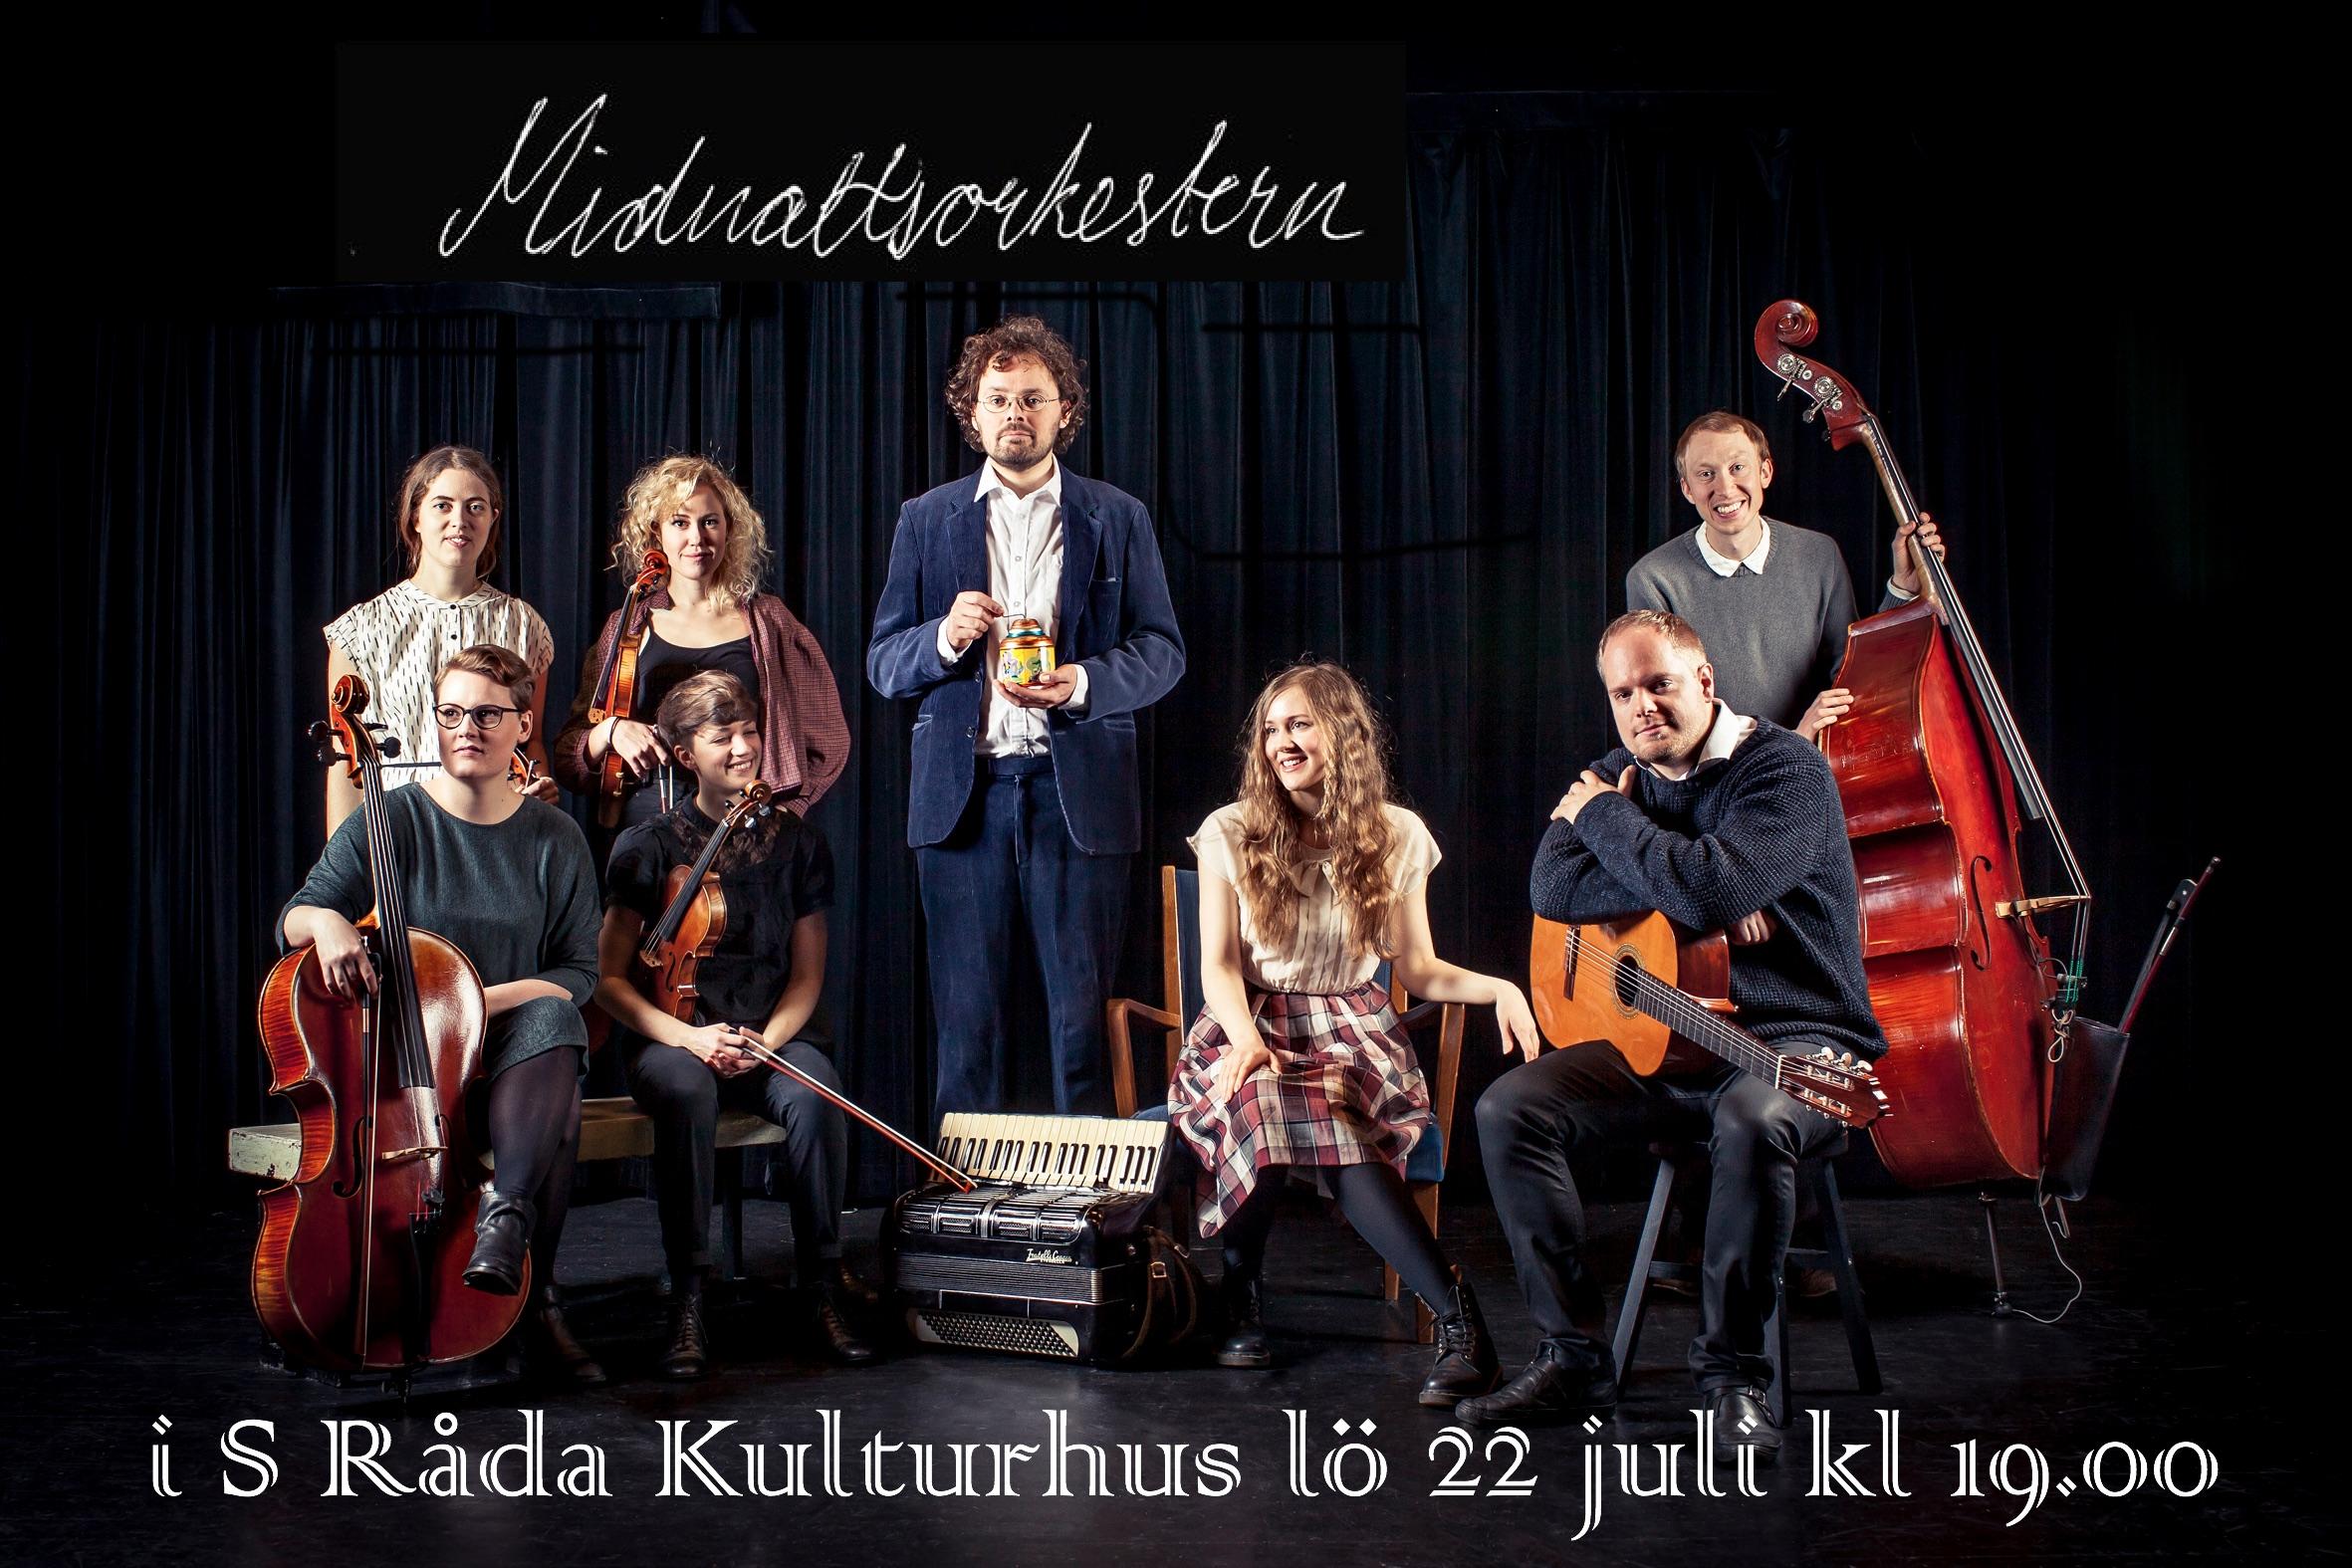 Midnattsorkestern besökte S Råda Kulturhus 22 juli 2017